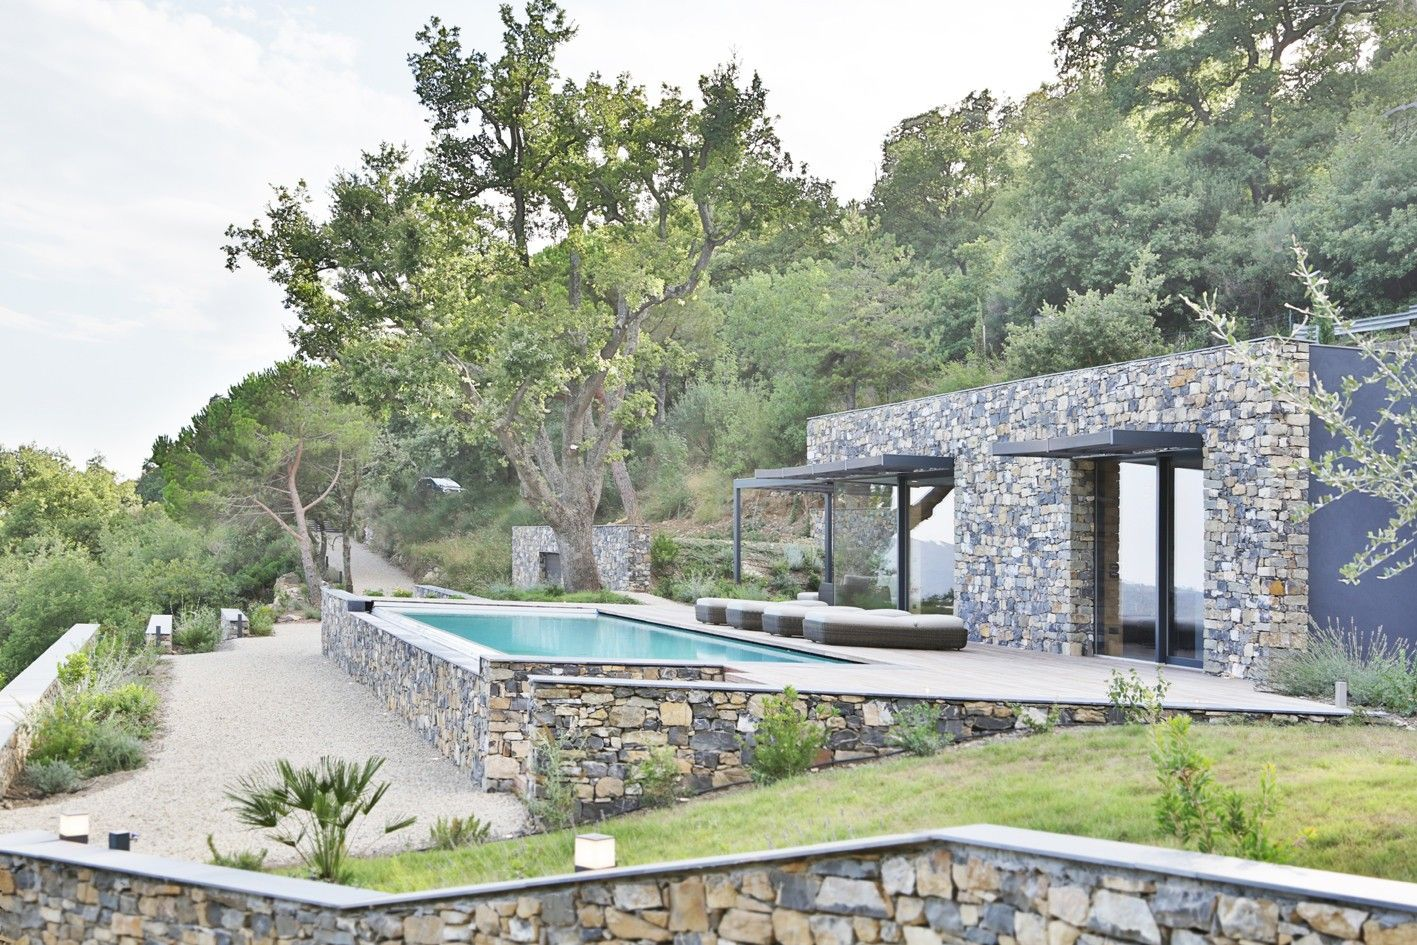 Villa n par giordano hadamik architects grande ouverture - Maison en pierre giordano hadamik architects ...